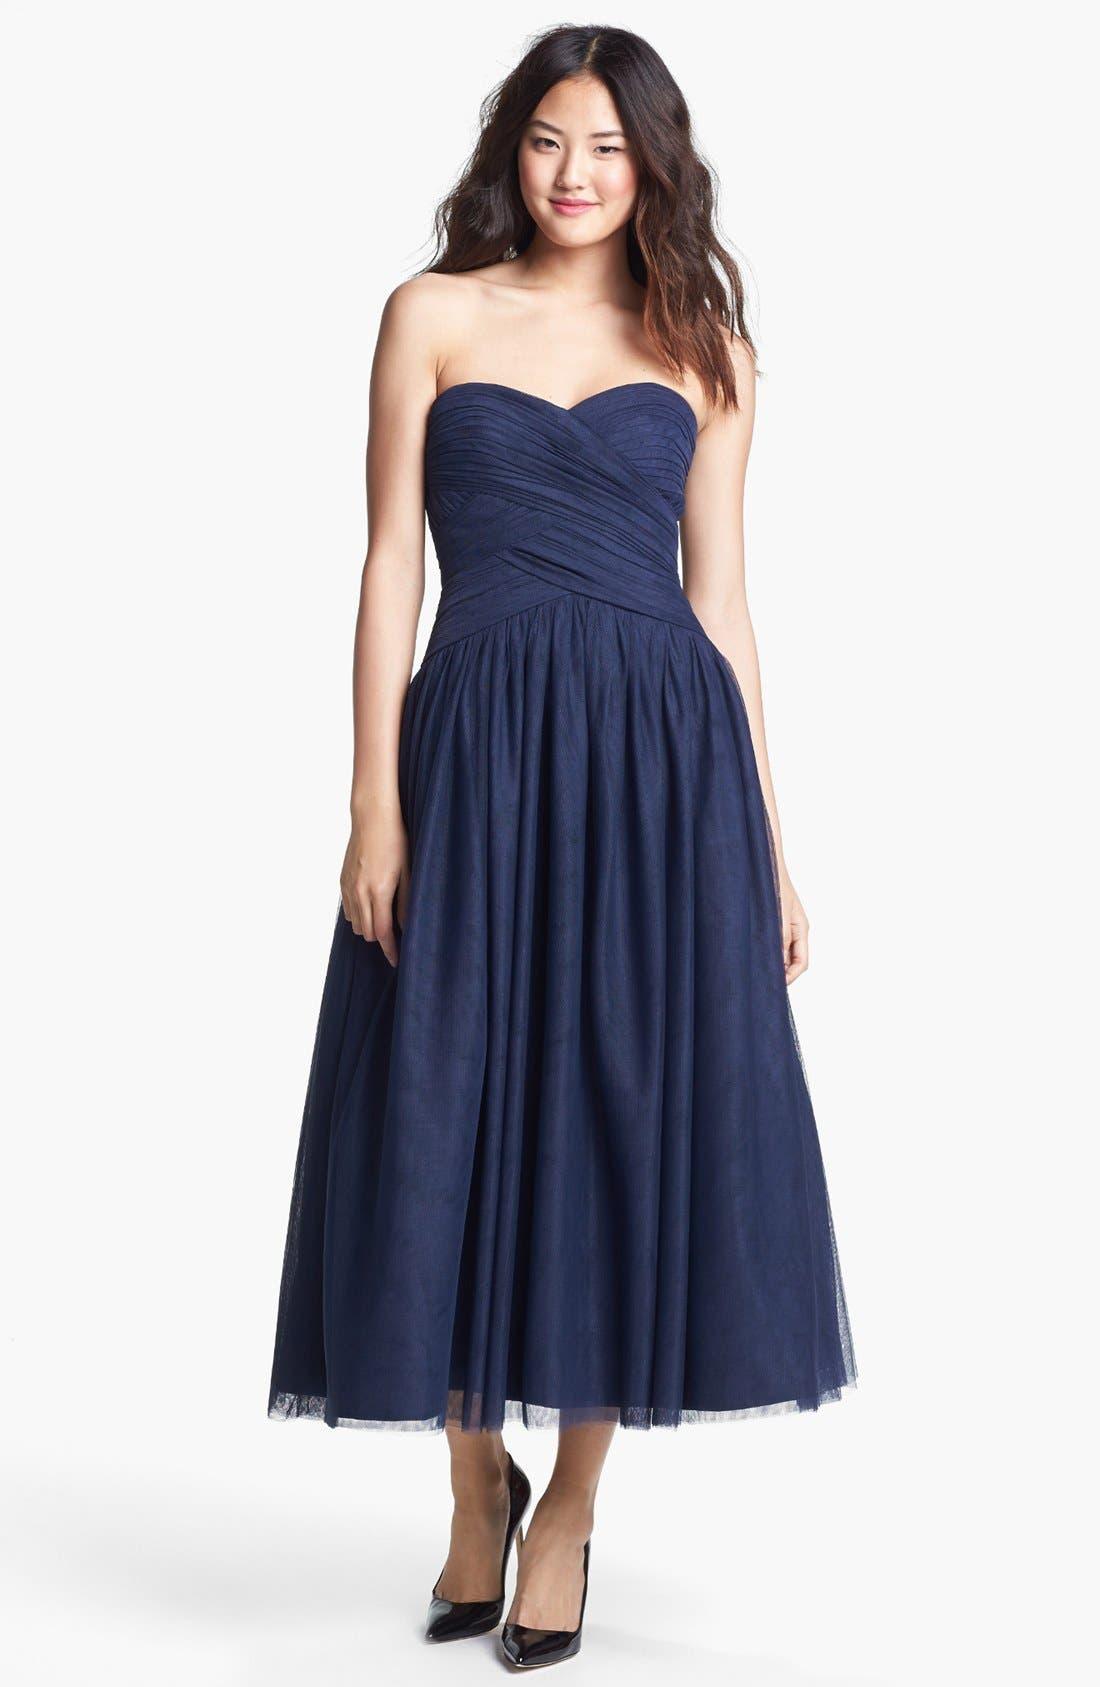 Alternate Image 1 Selected - ML Monique Lhuillier Tulle Fit & Flare Dress